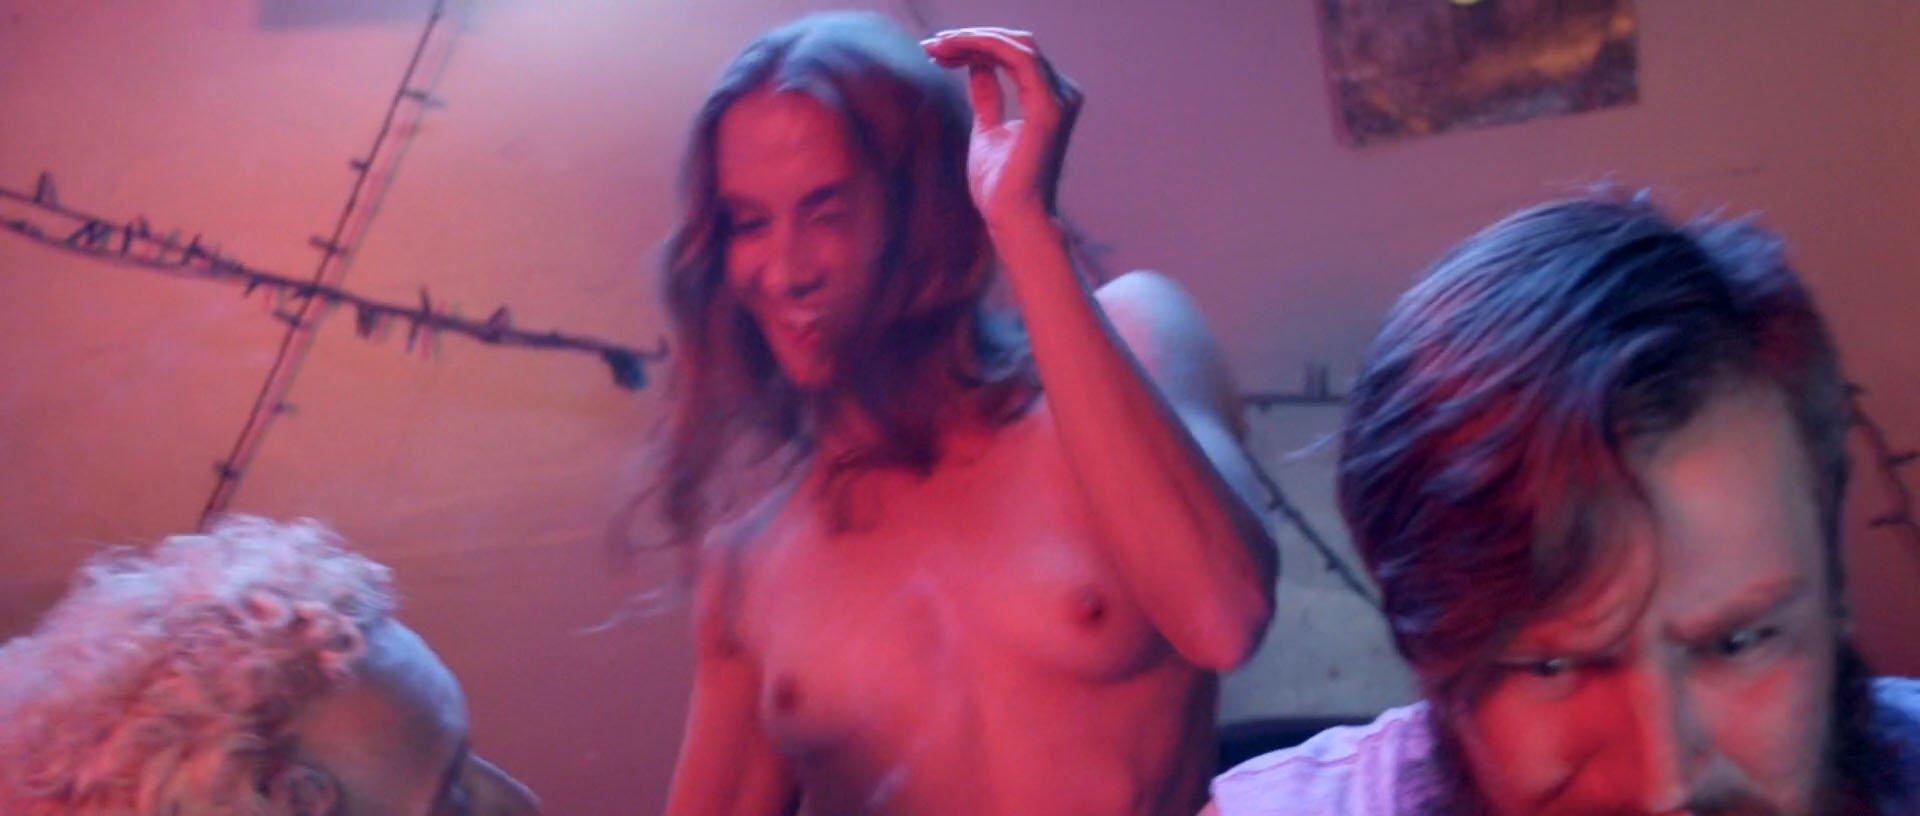 nudist groups around curitiba